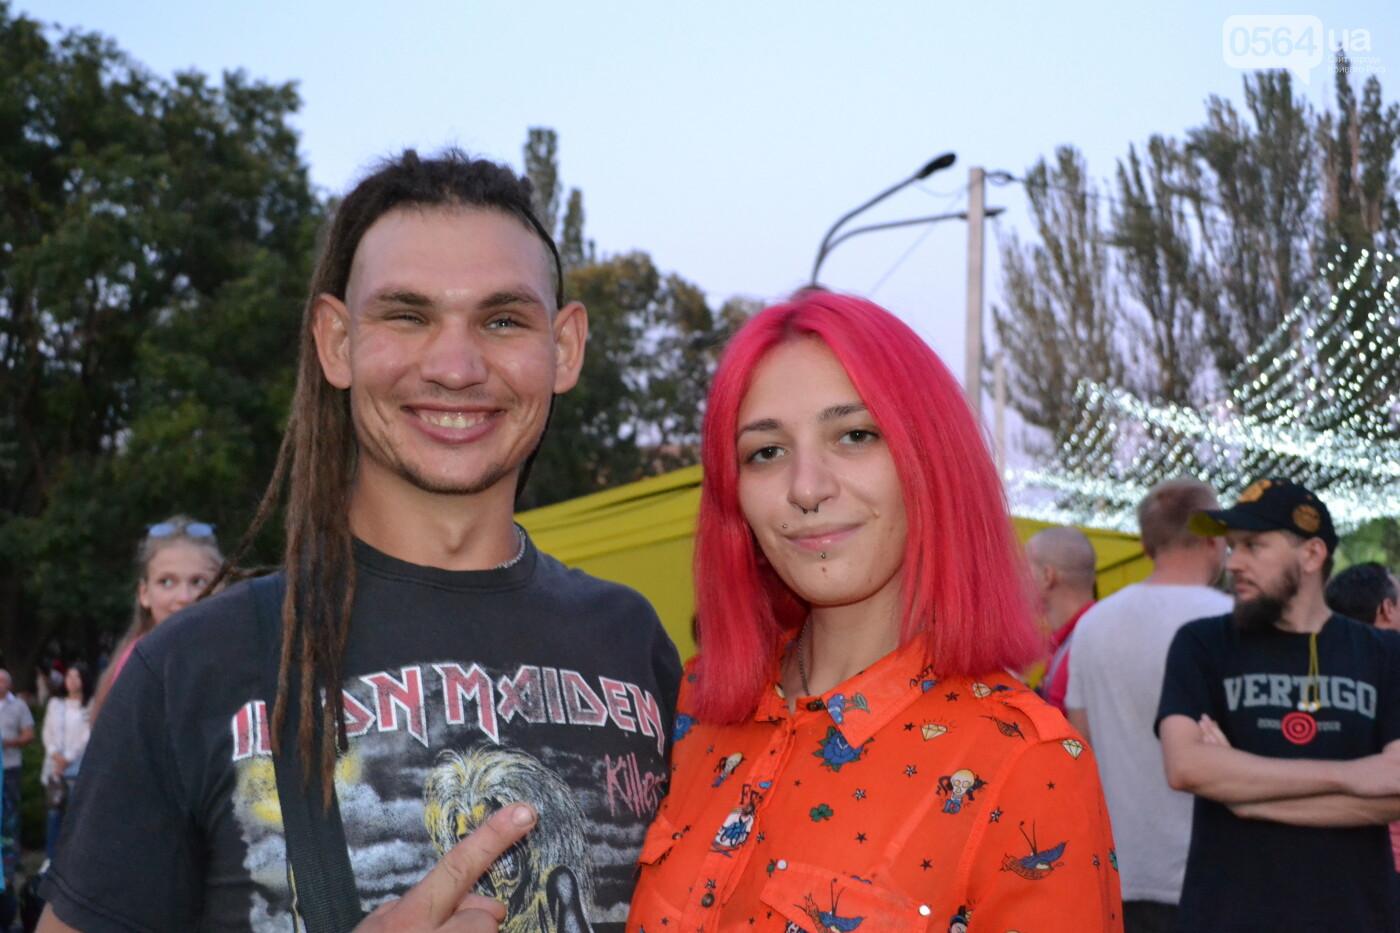 "Hairstyles рок-фестиваля: ""ЗаліZна міць"" собрала криворожан с ярко выраженной индивидуальностью, - ФОТО, фото-8"